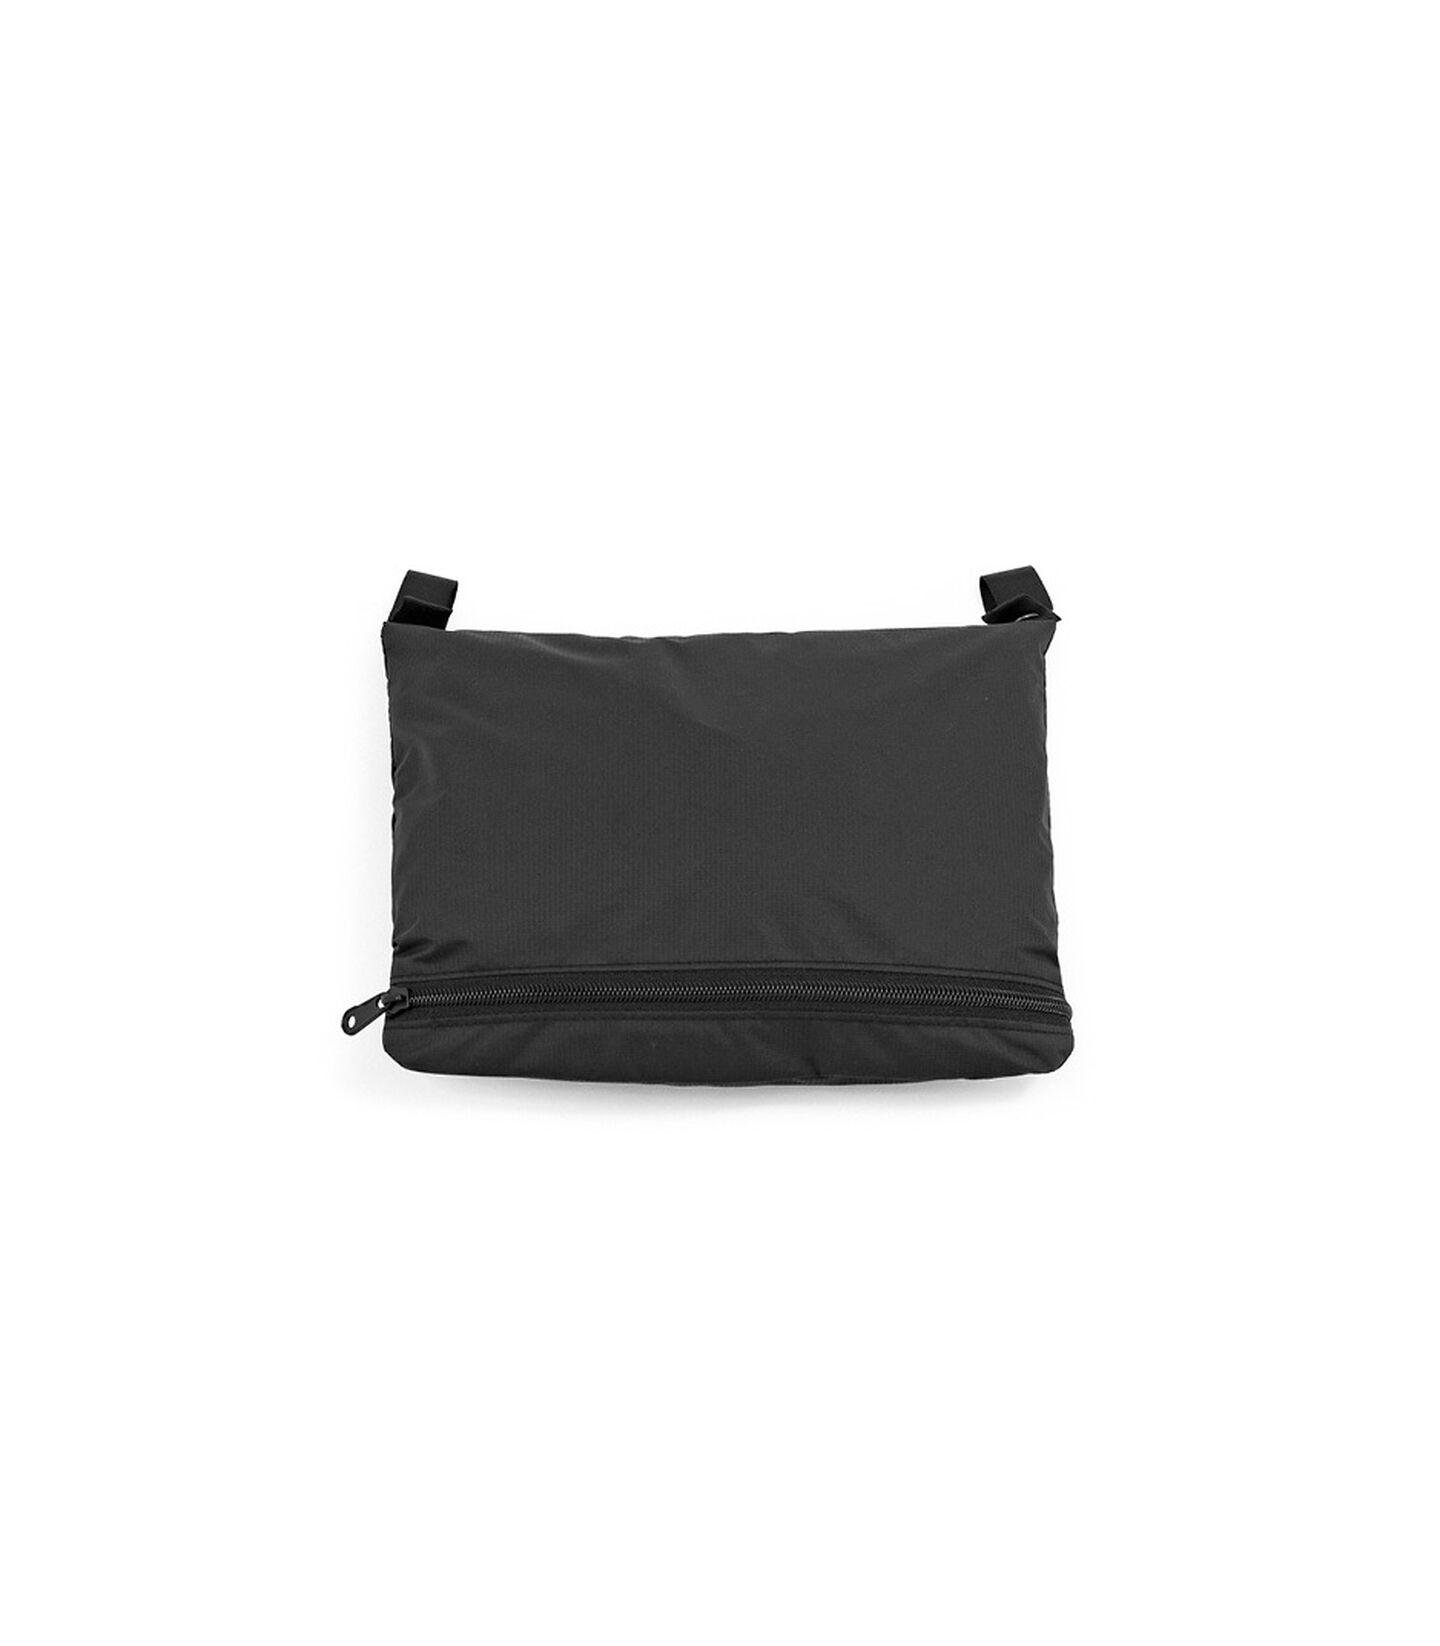 Stokke® Xplory® X Regenschutz Black, Black, mainview view 5